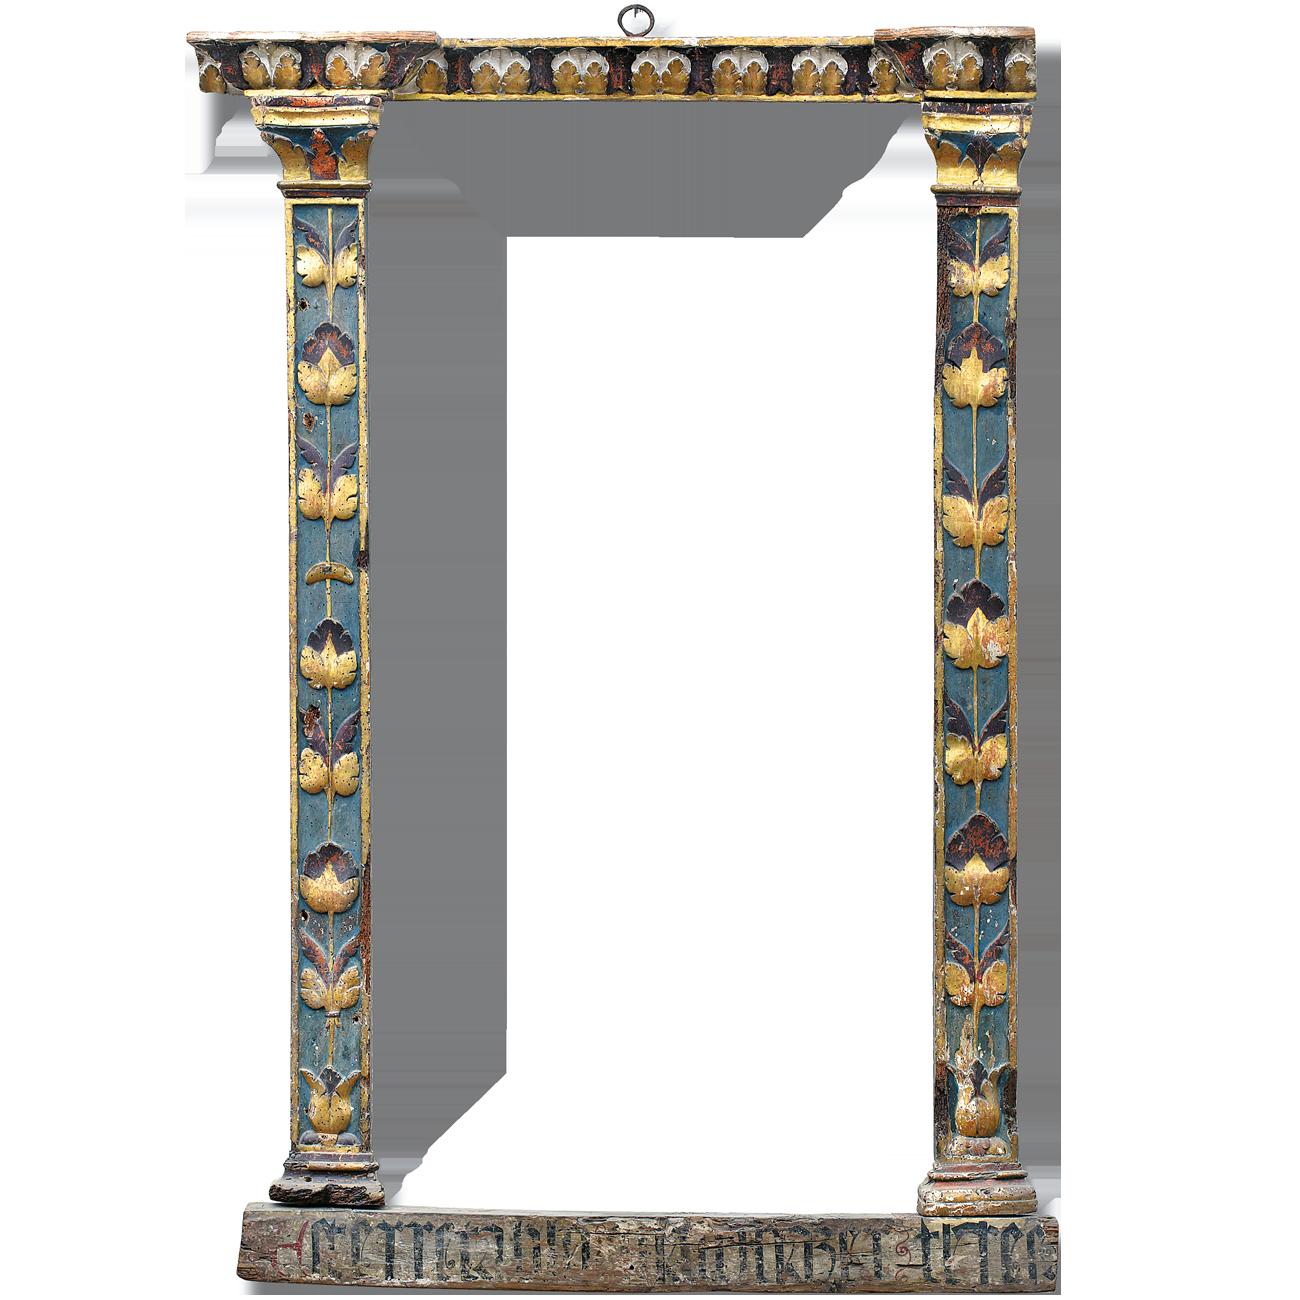 Rahmen - Farben - Spiel - Antike Rahmen